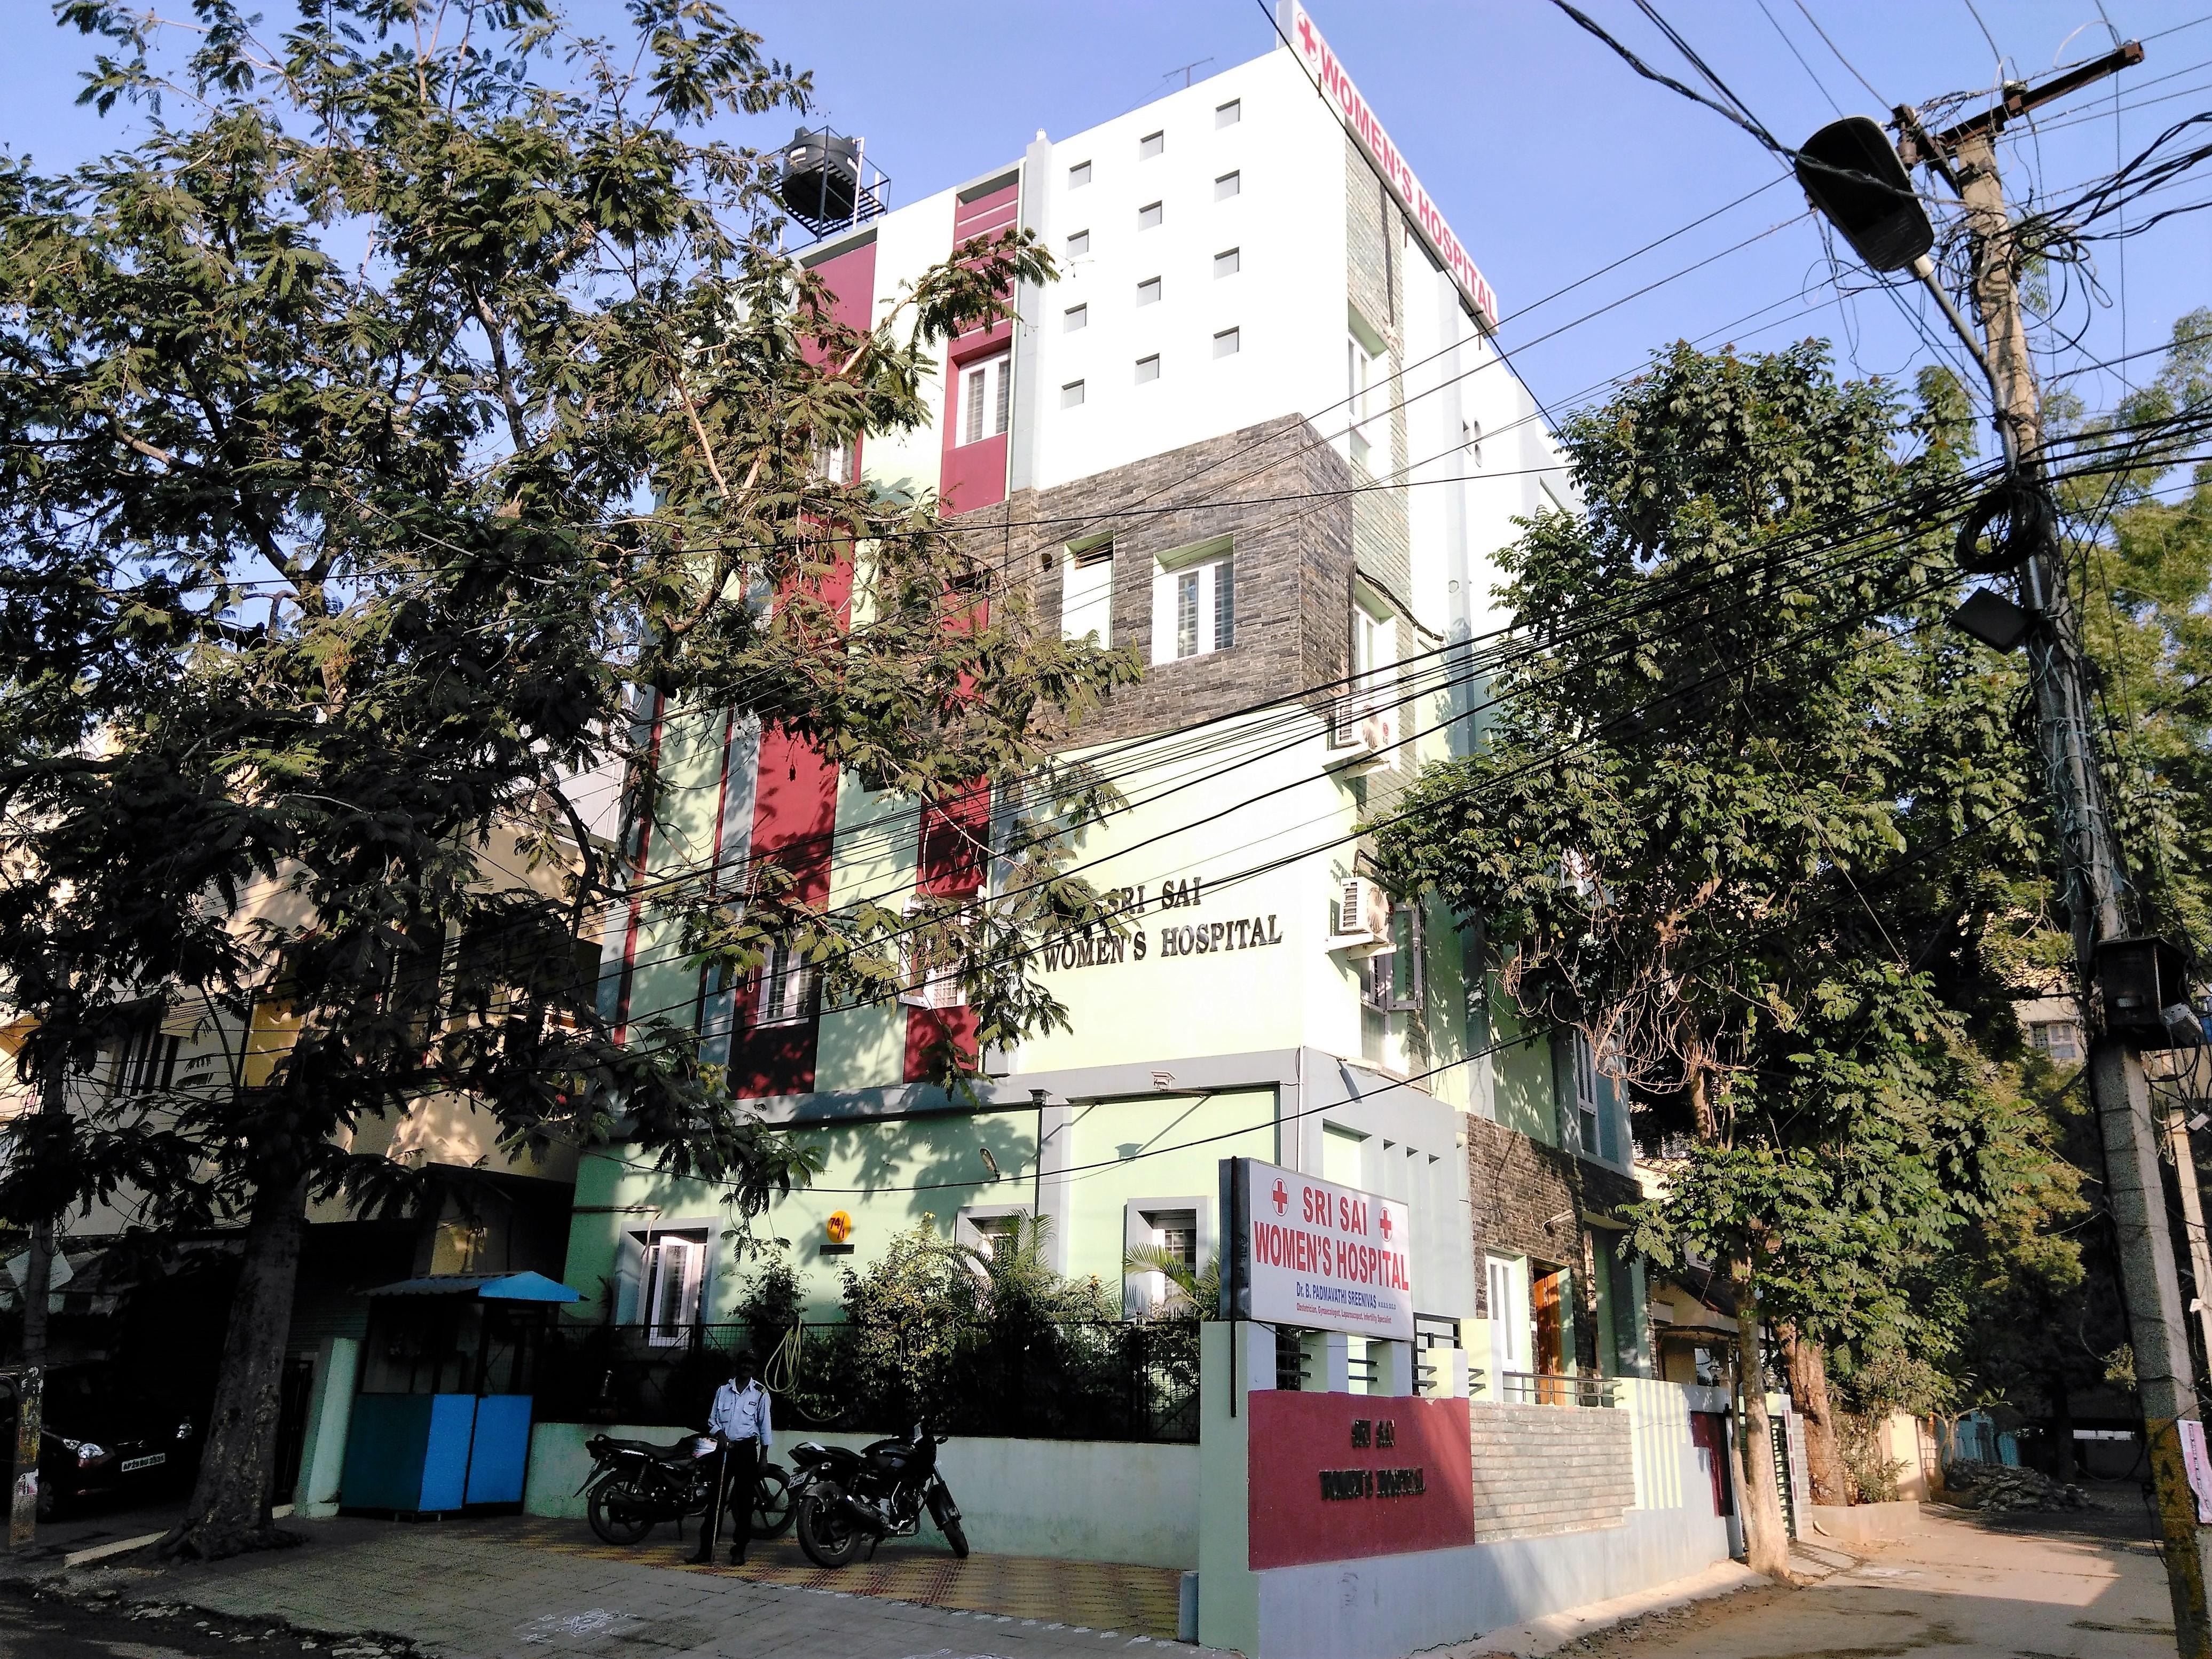 Sri Sai Womens Hospital